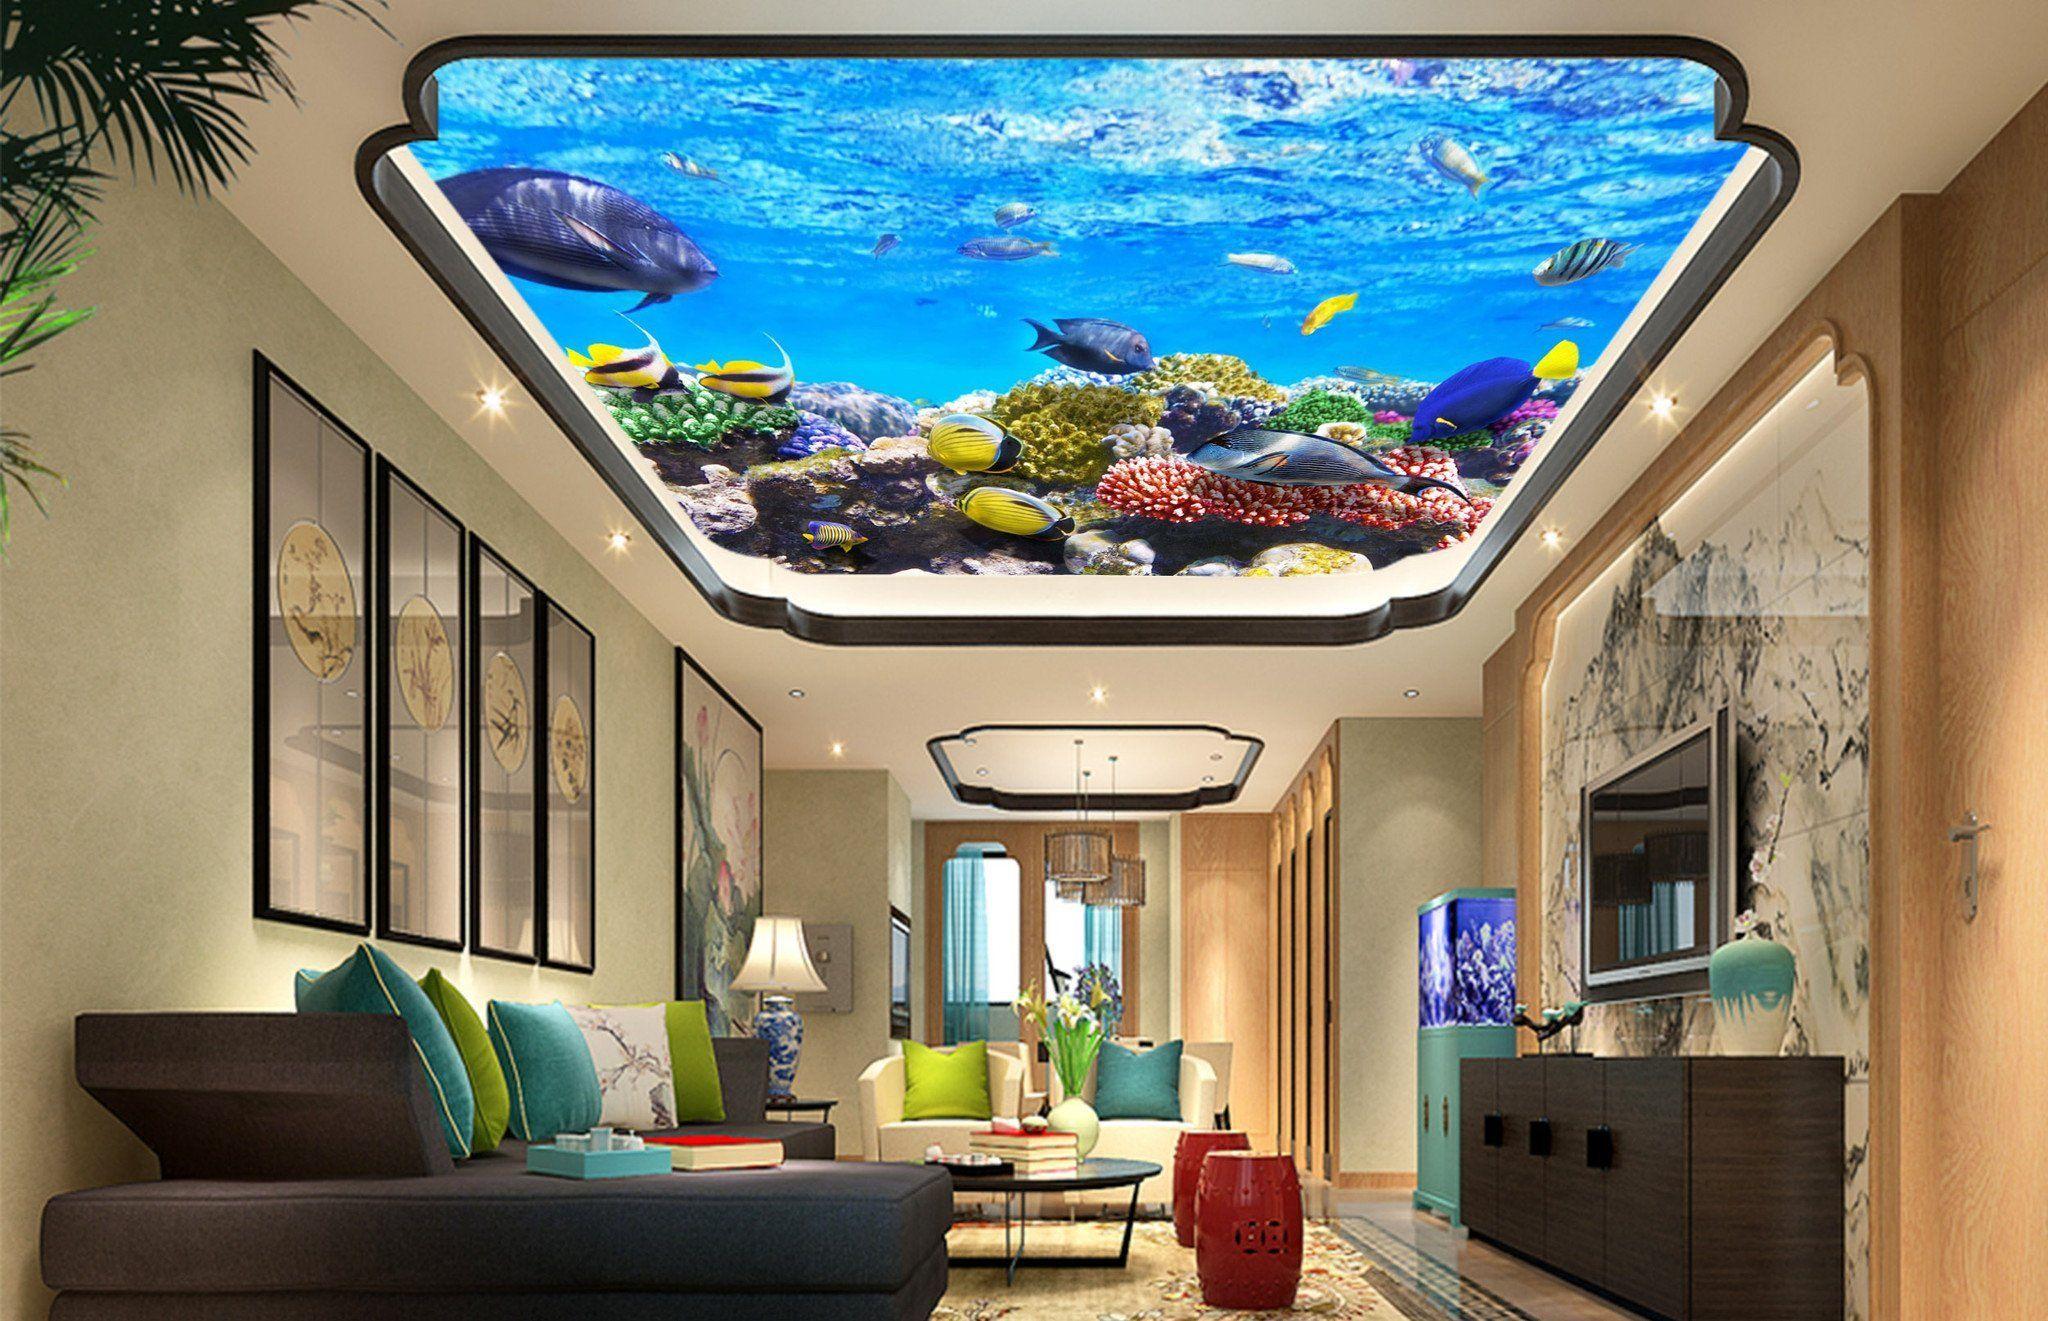 Ocean Corals Fishes